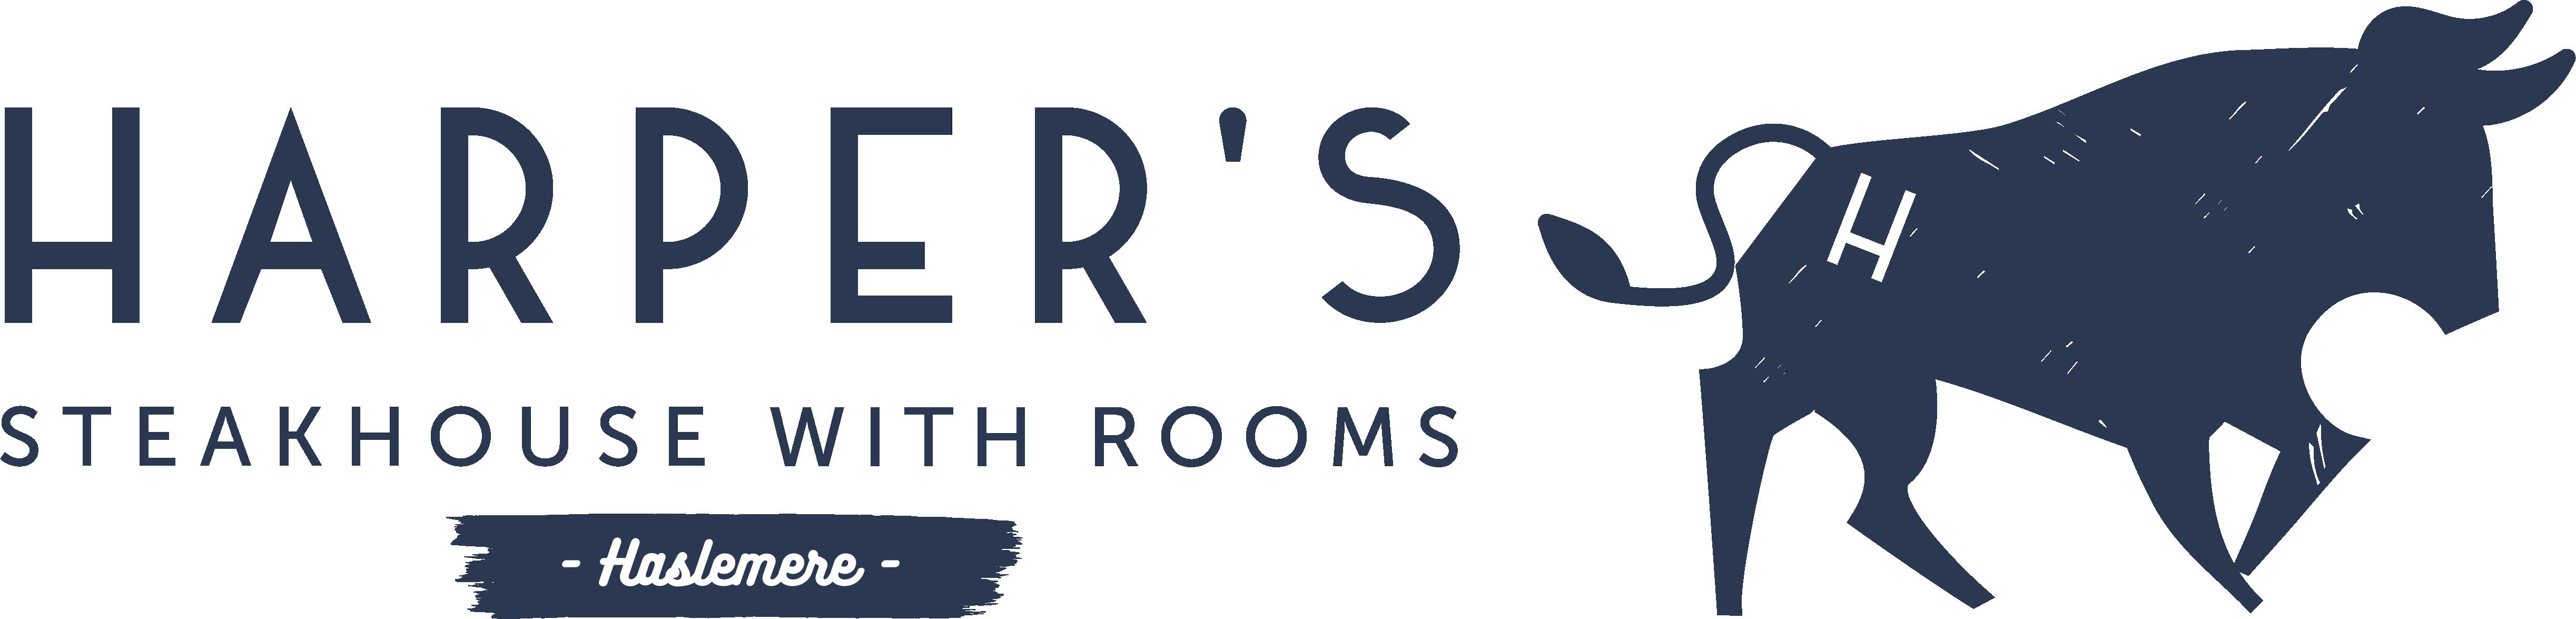 Logo of Harper's at Haslemere - Upham Pub Co.